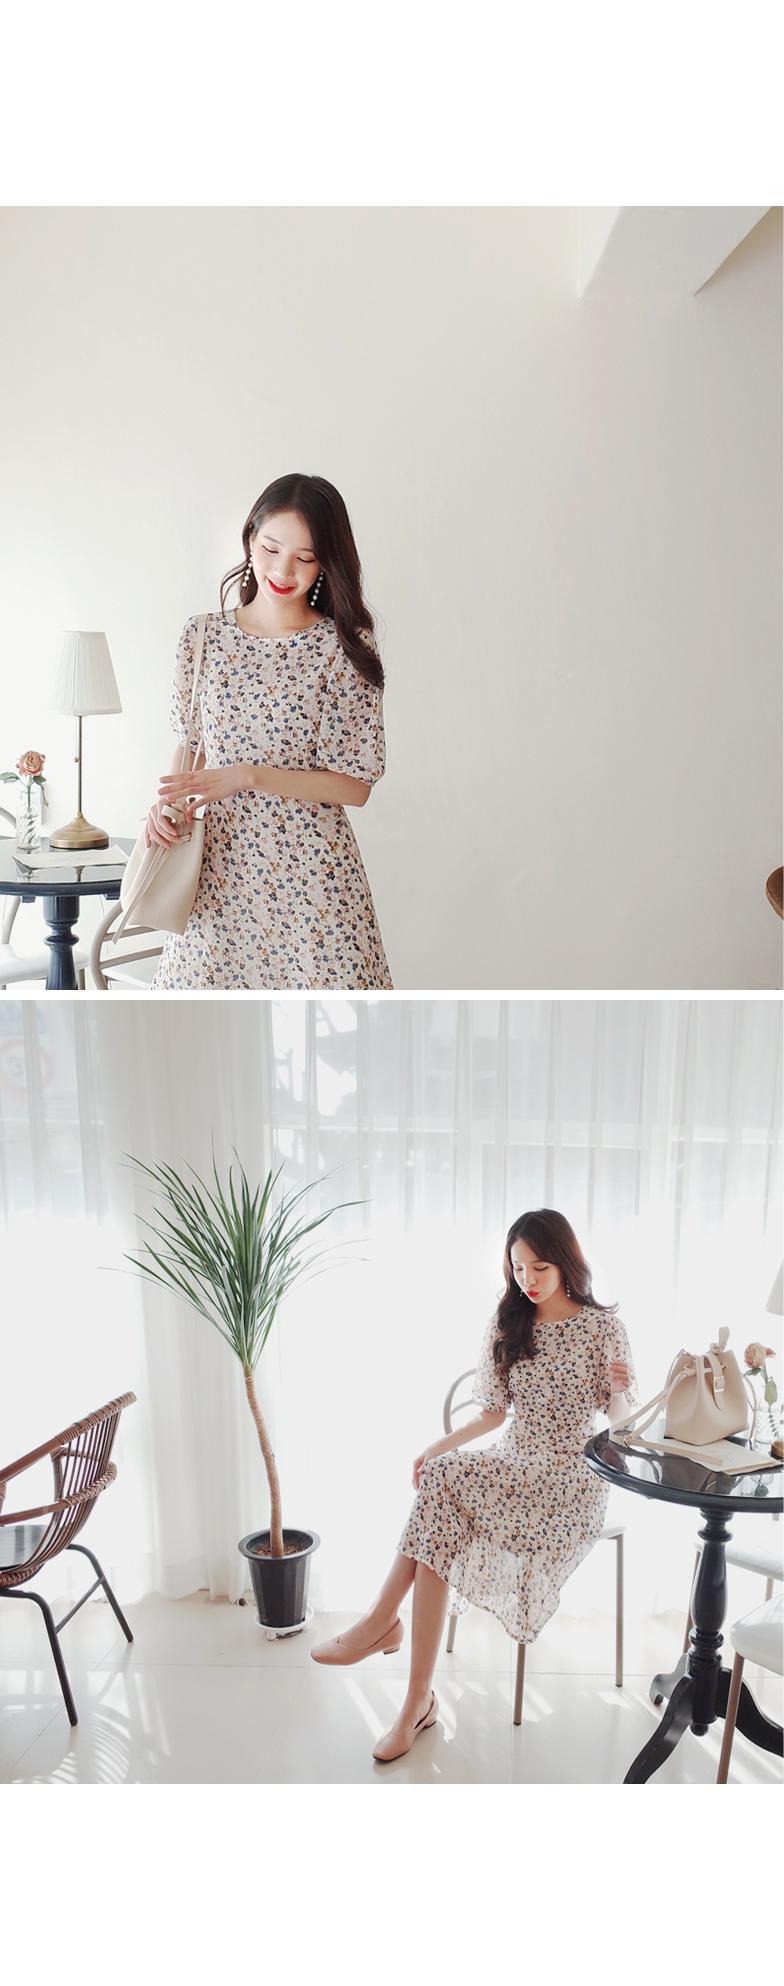 Cheung Soo poten dress